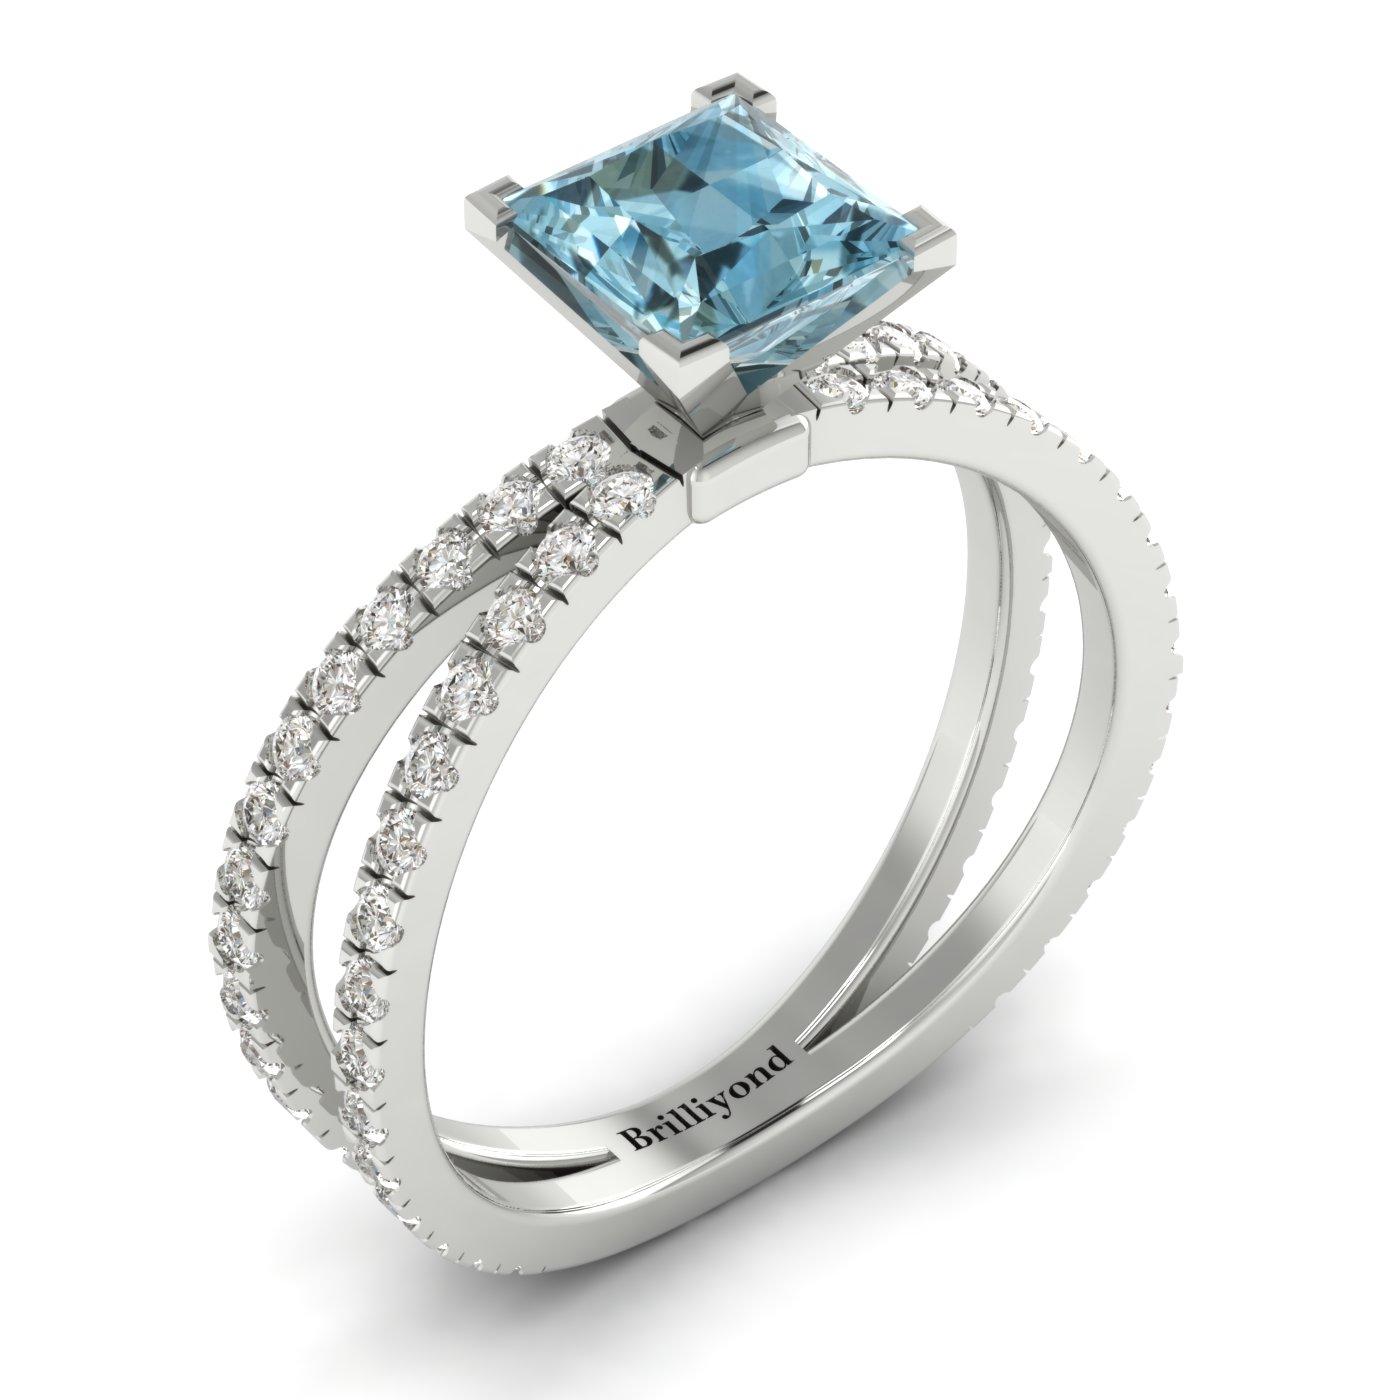 Aquamarine White Gold Princess Cut Engagement Ring Florentine